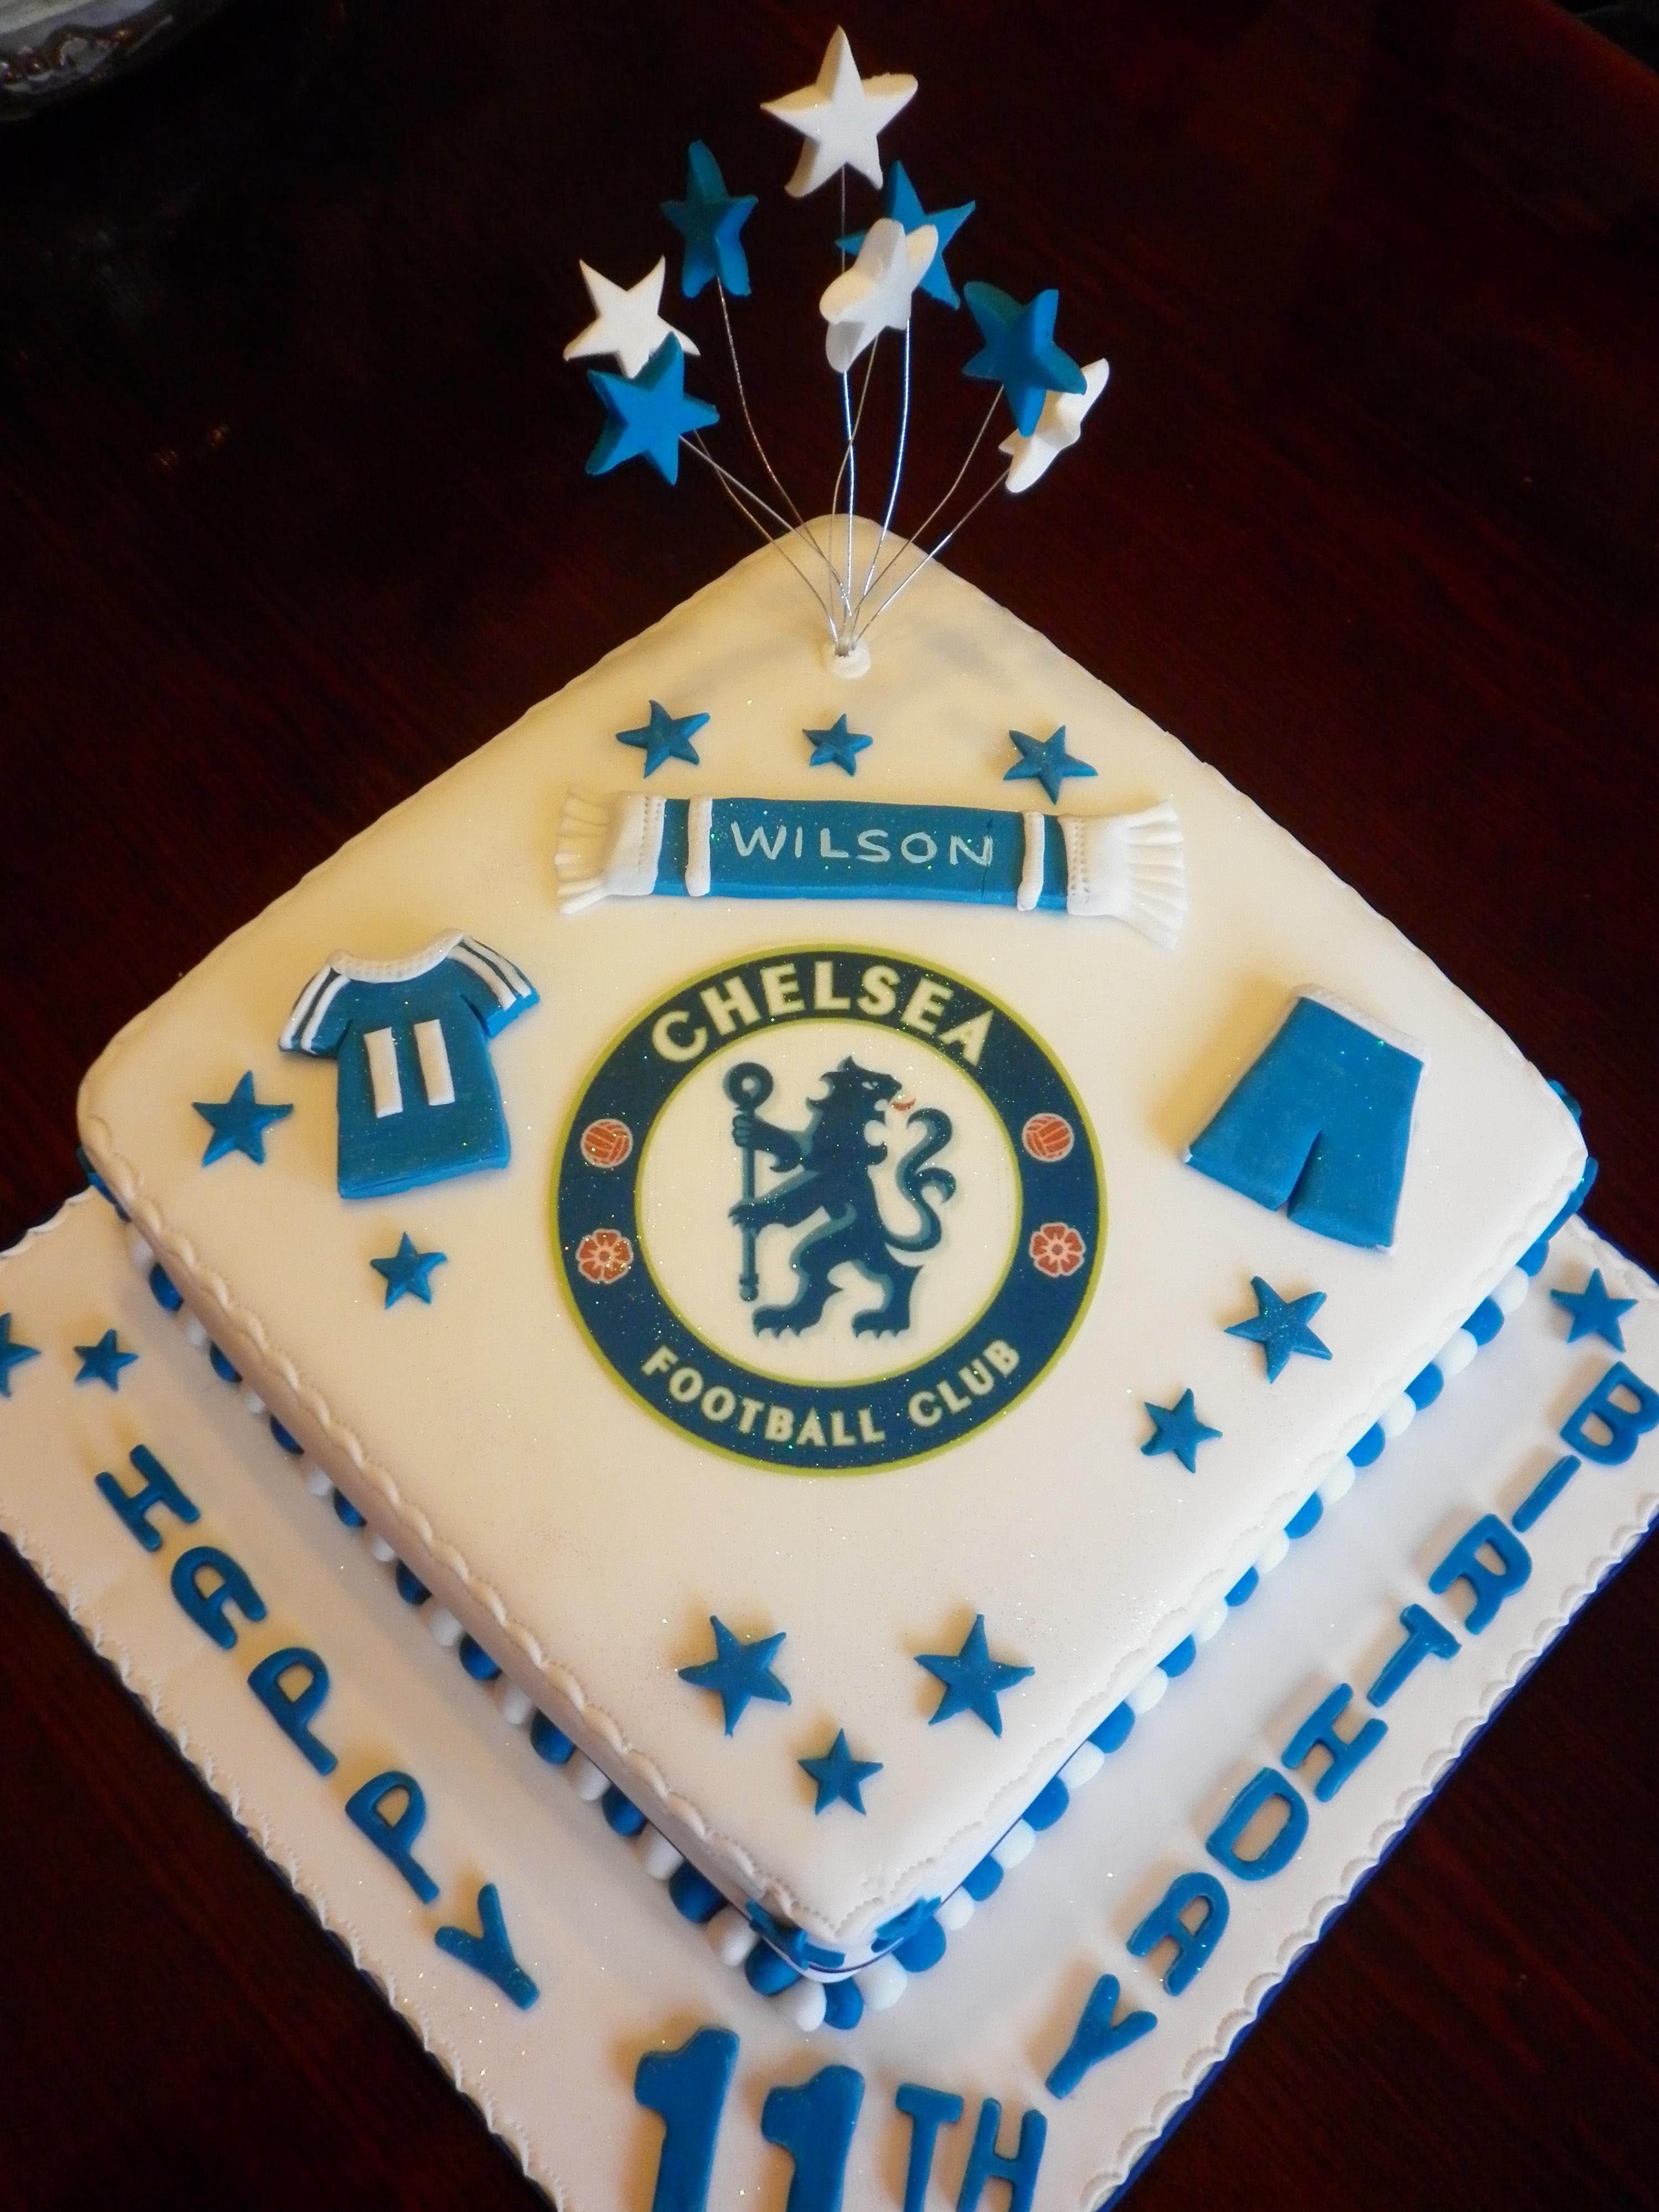 Astonishing Chelsea Football Cake Cakecentral Com Personalised Birthday Cards Veneteletsinfo